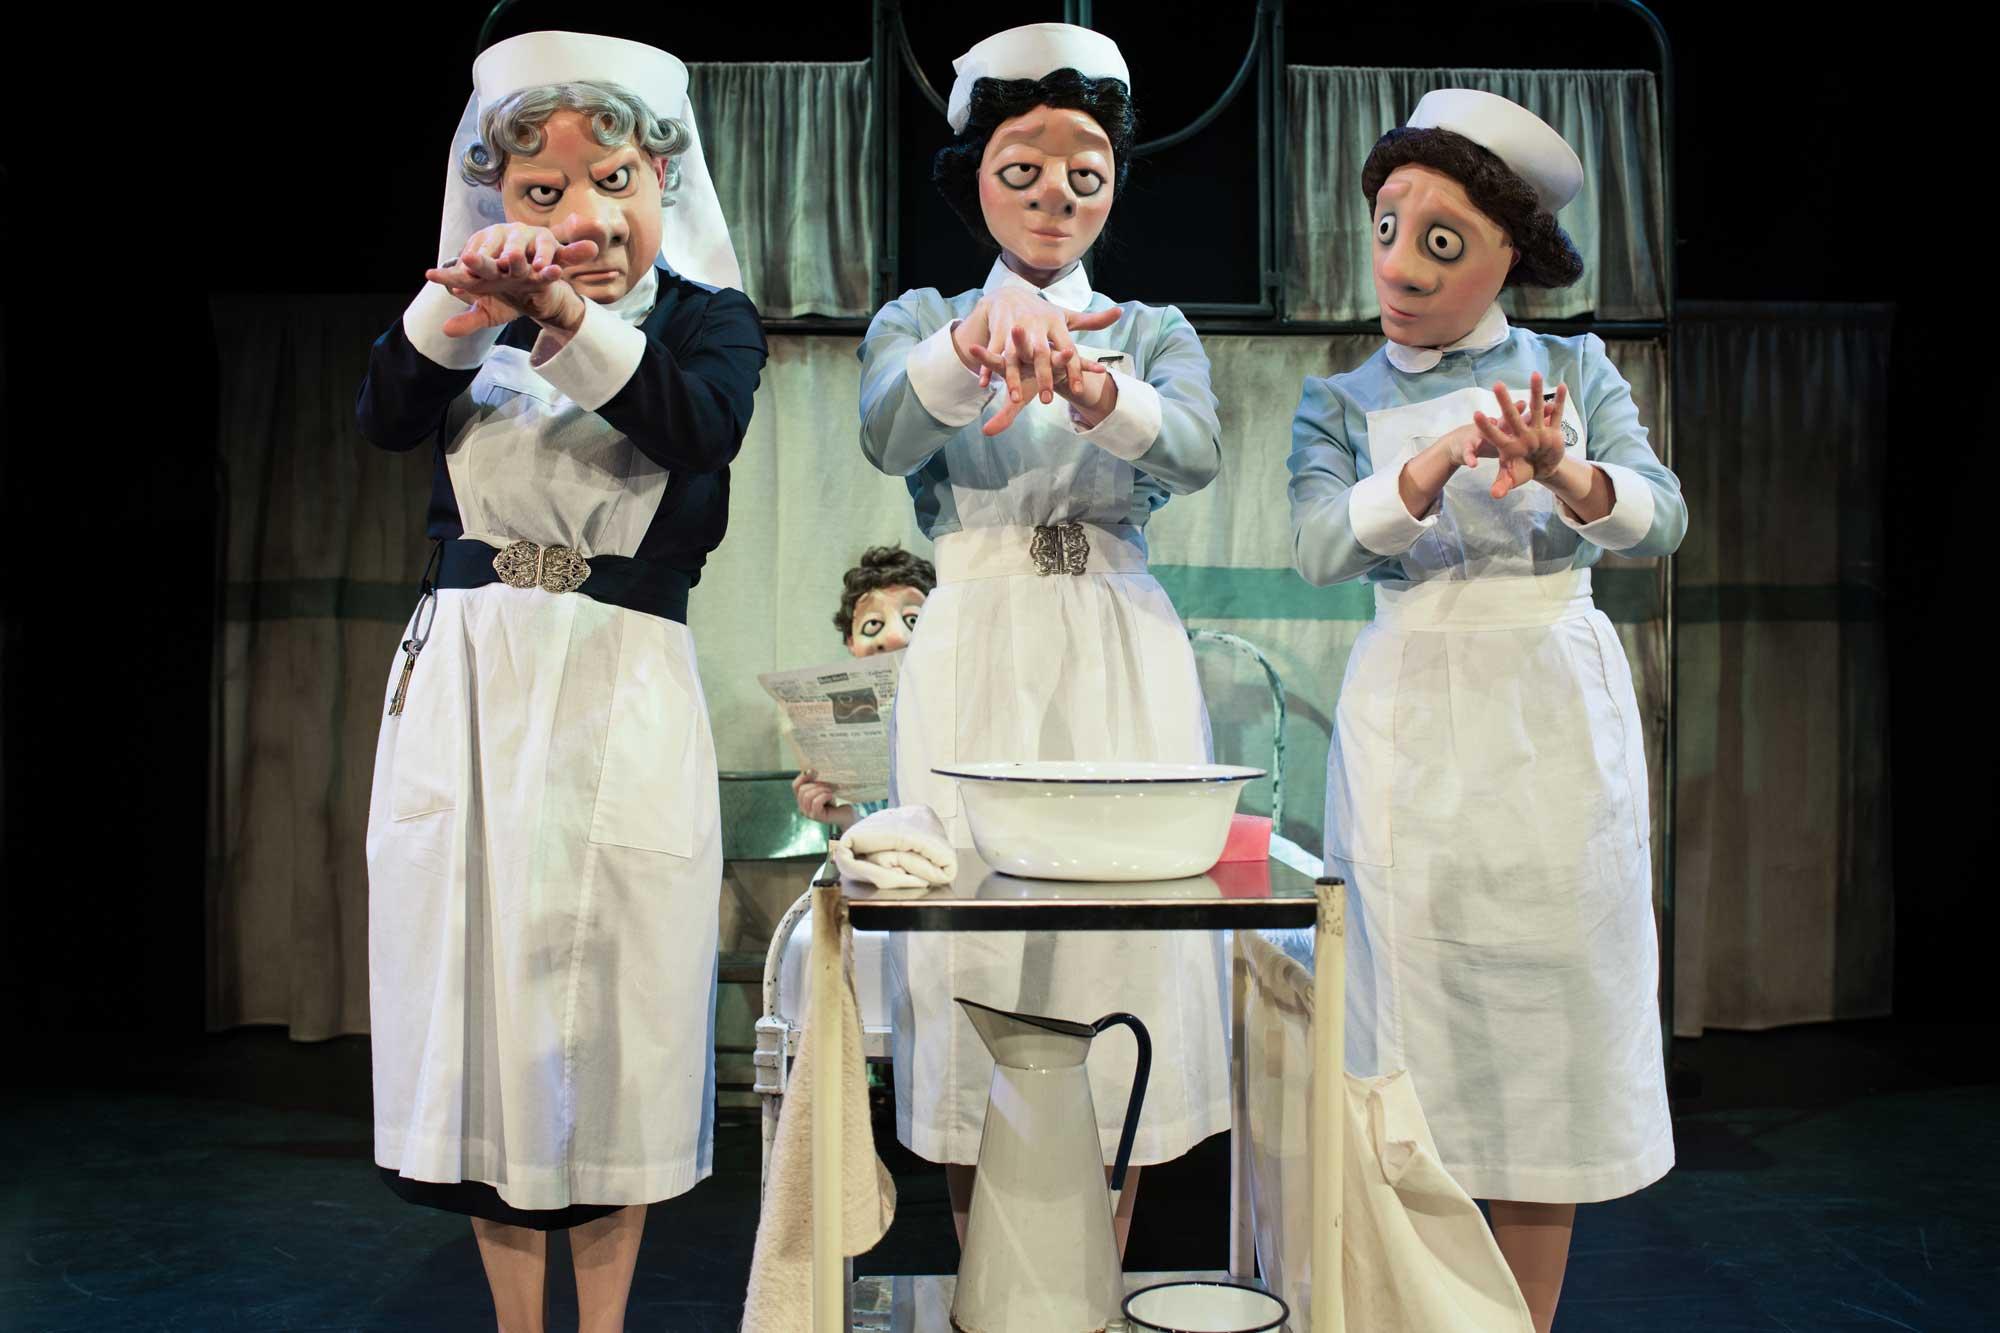 Three nurses washing hands